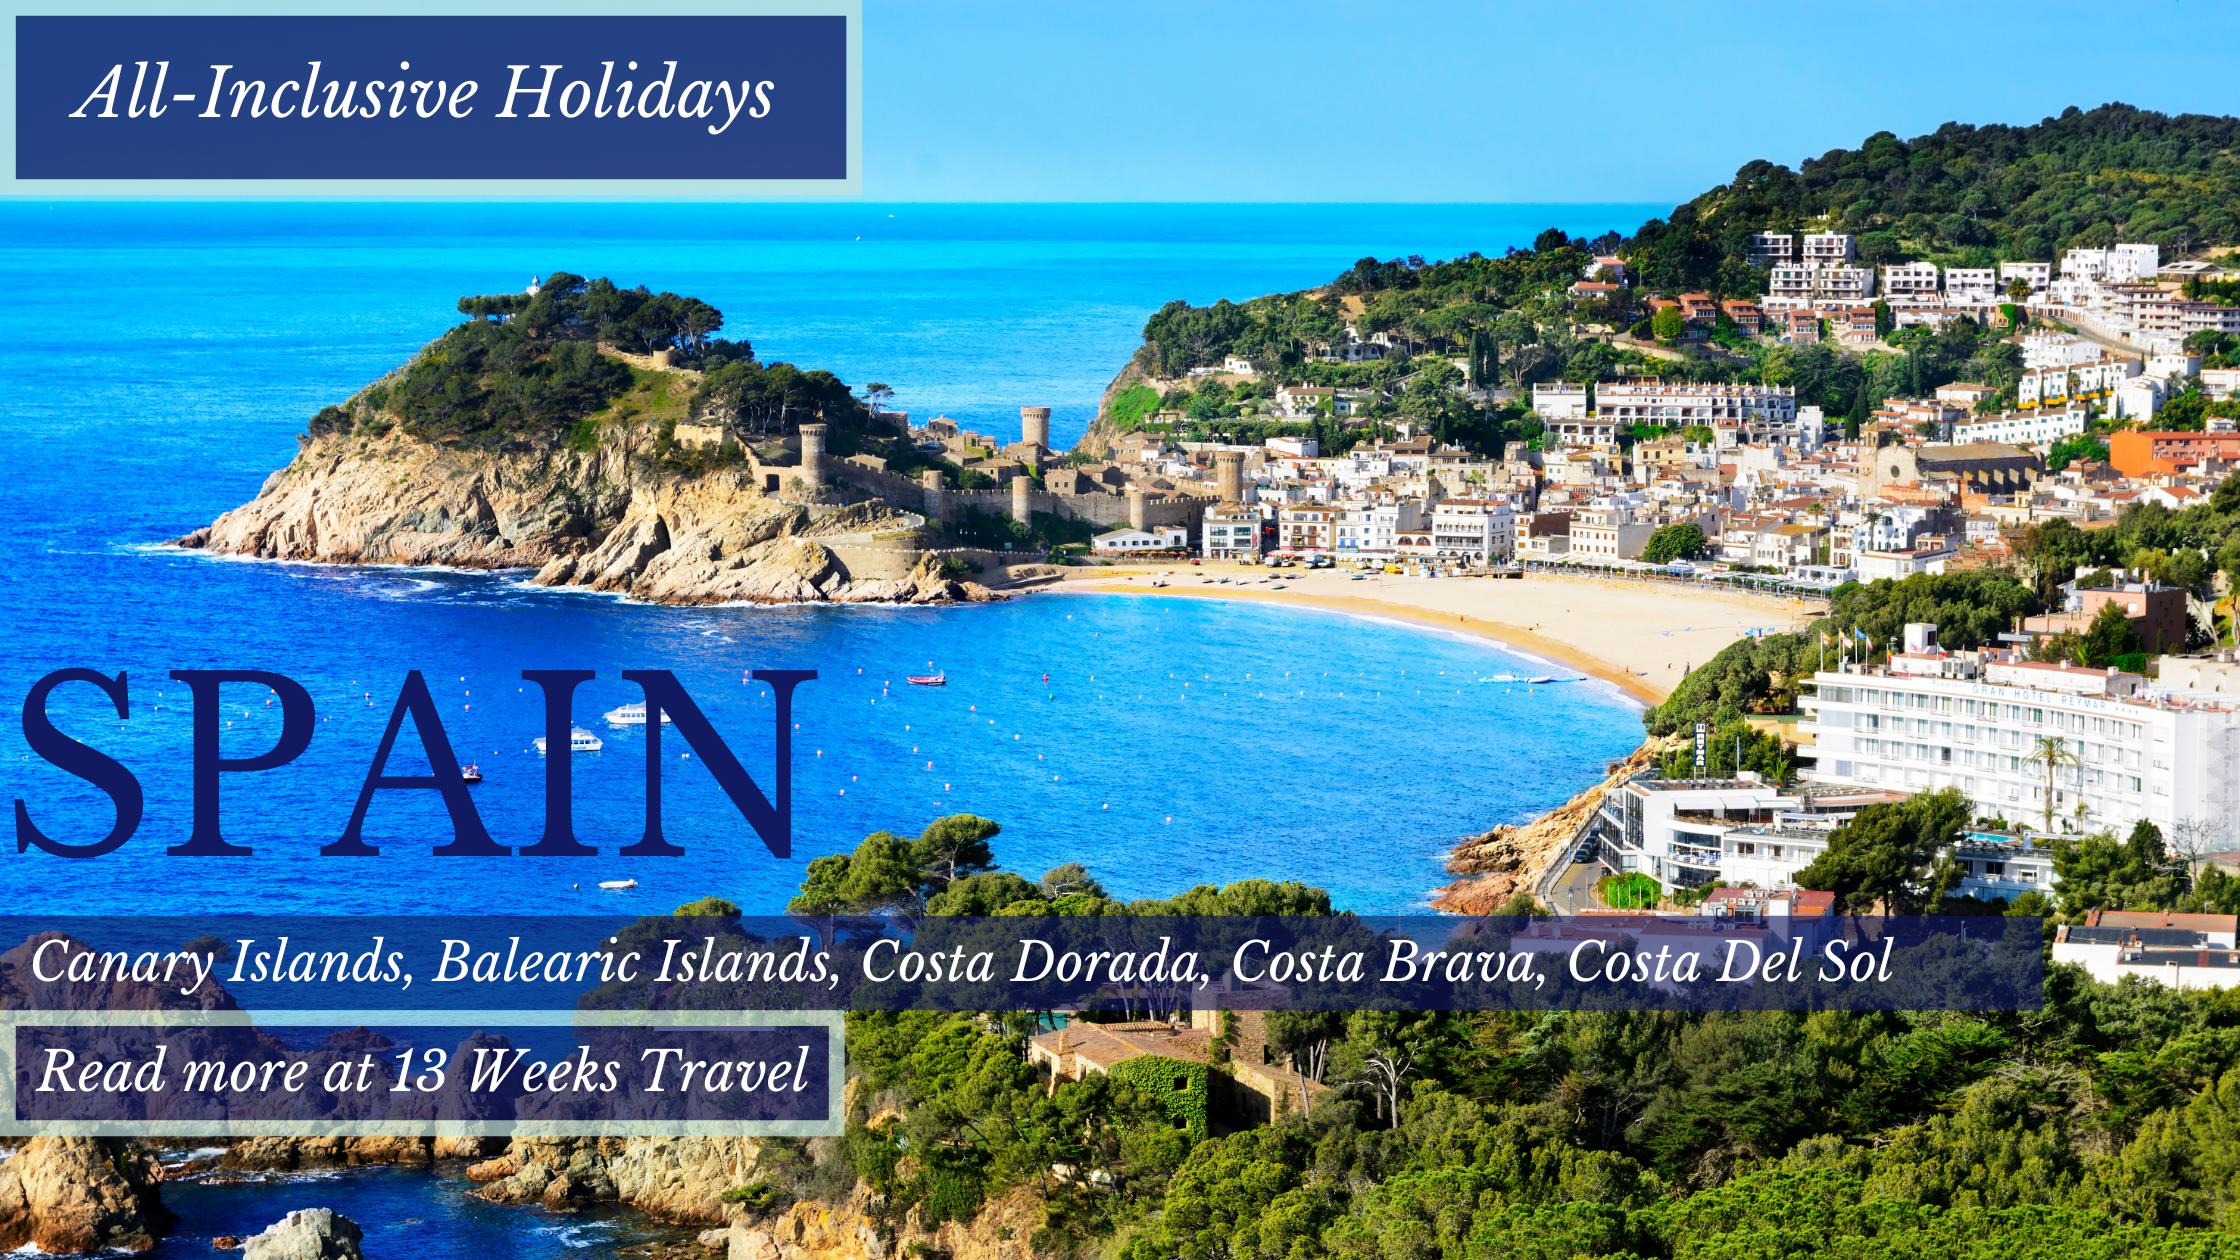 All Inclusive Holidays Spain |Costa Brava | 13 Weeks Travel